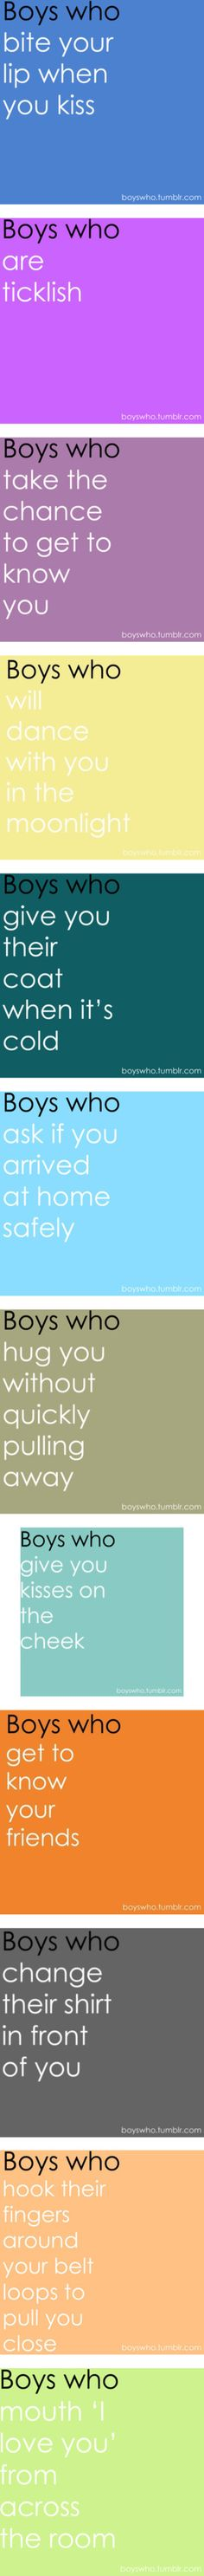 """I like Boys who..."" by i-am-the-girl-on-fire on Polyvore"